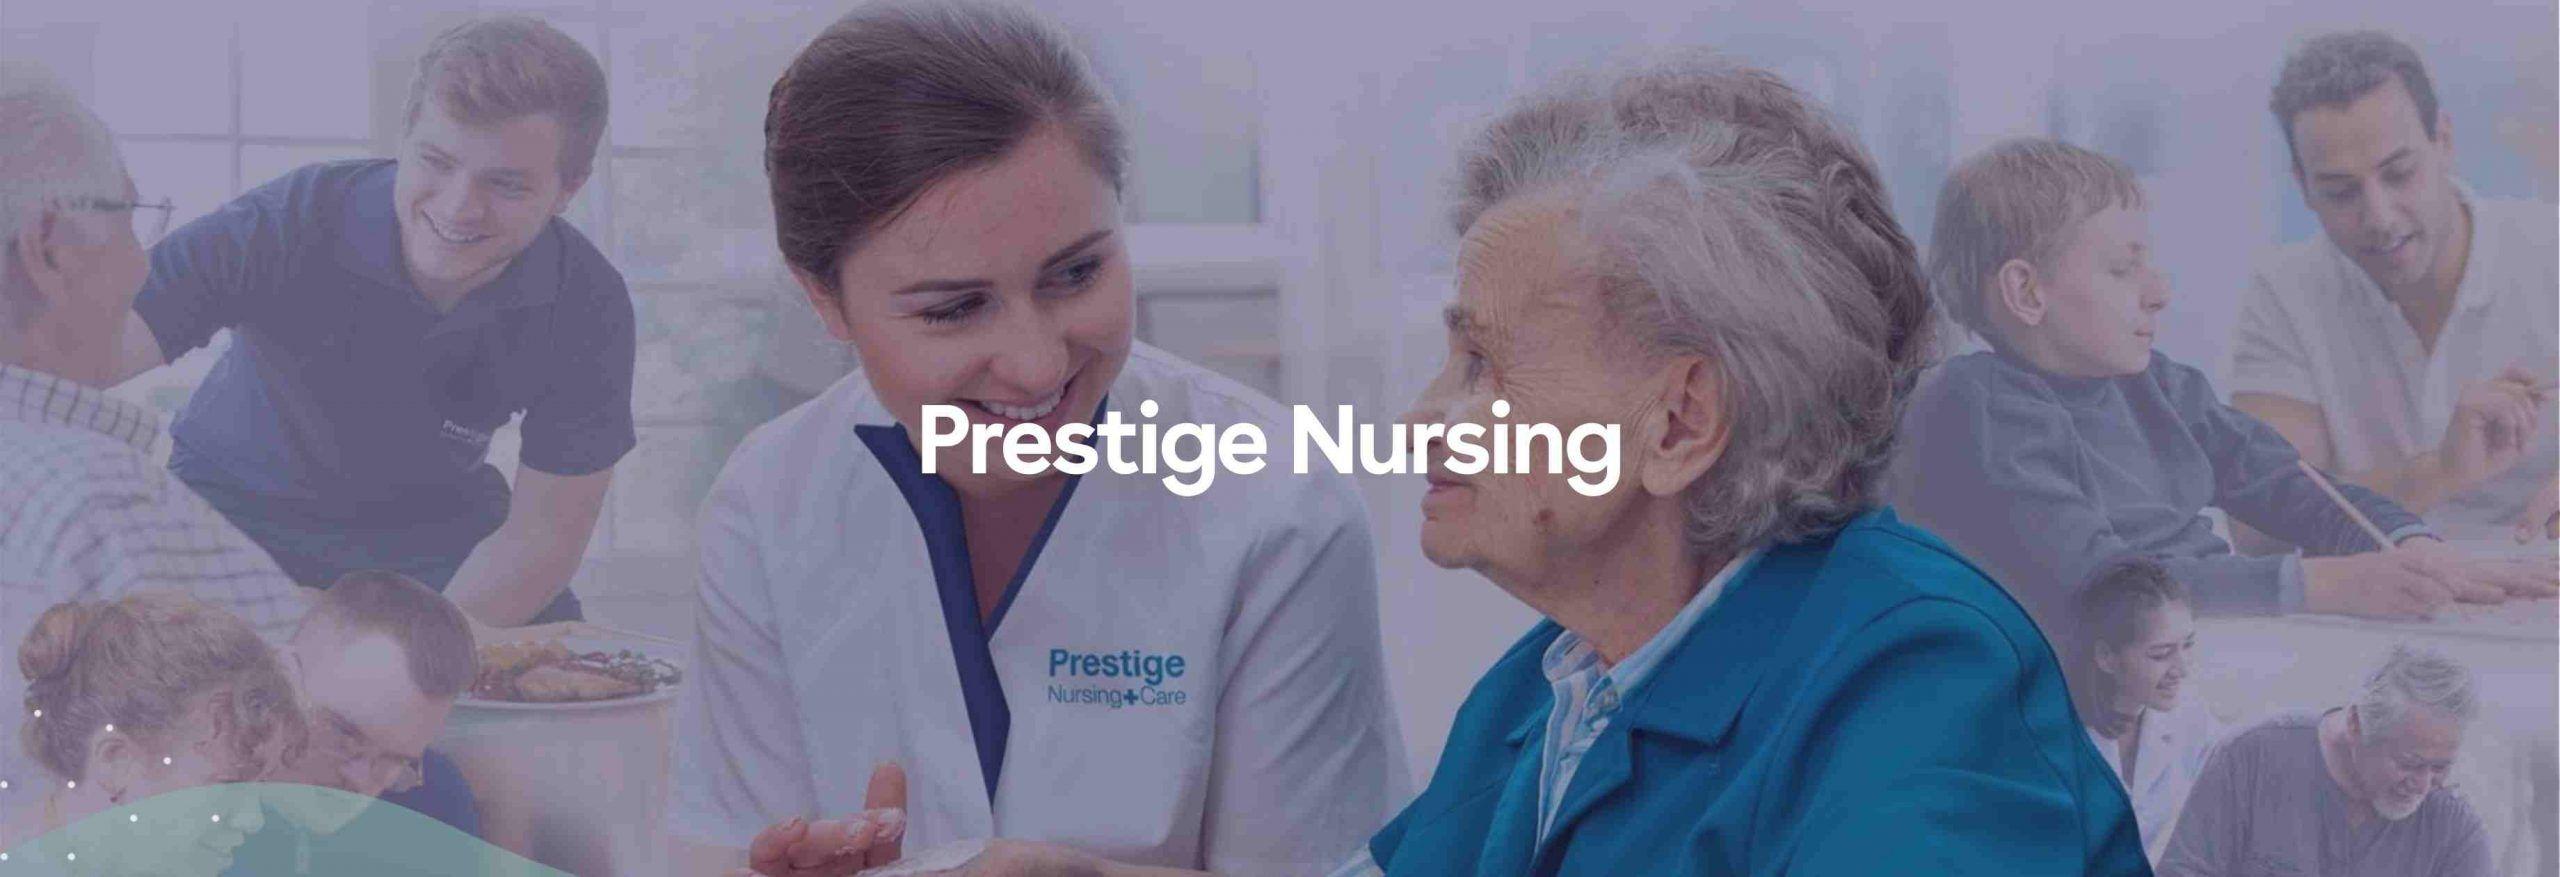 prestige nursing